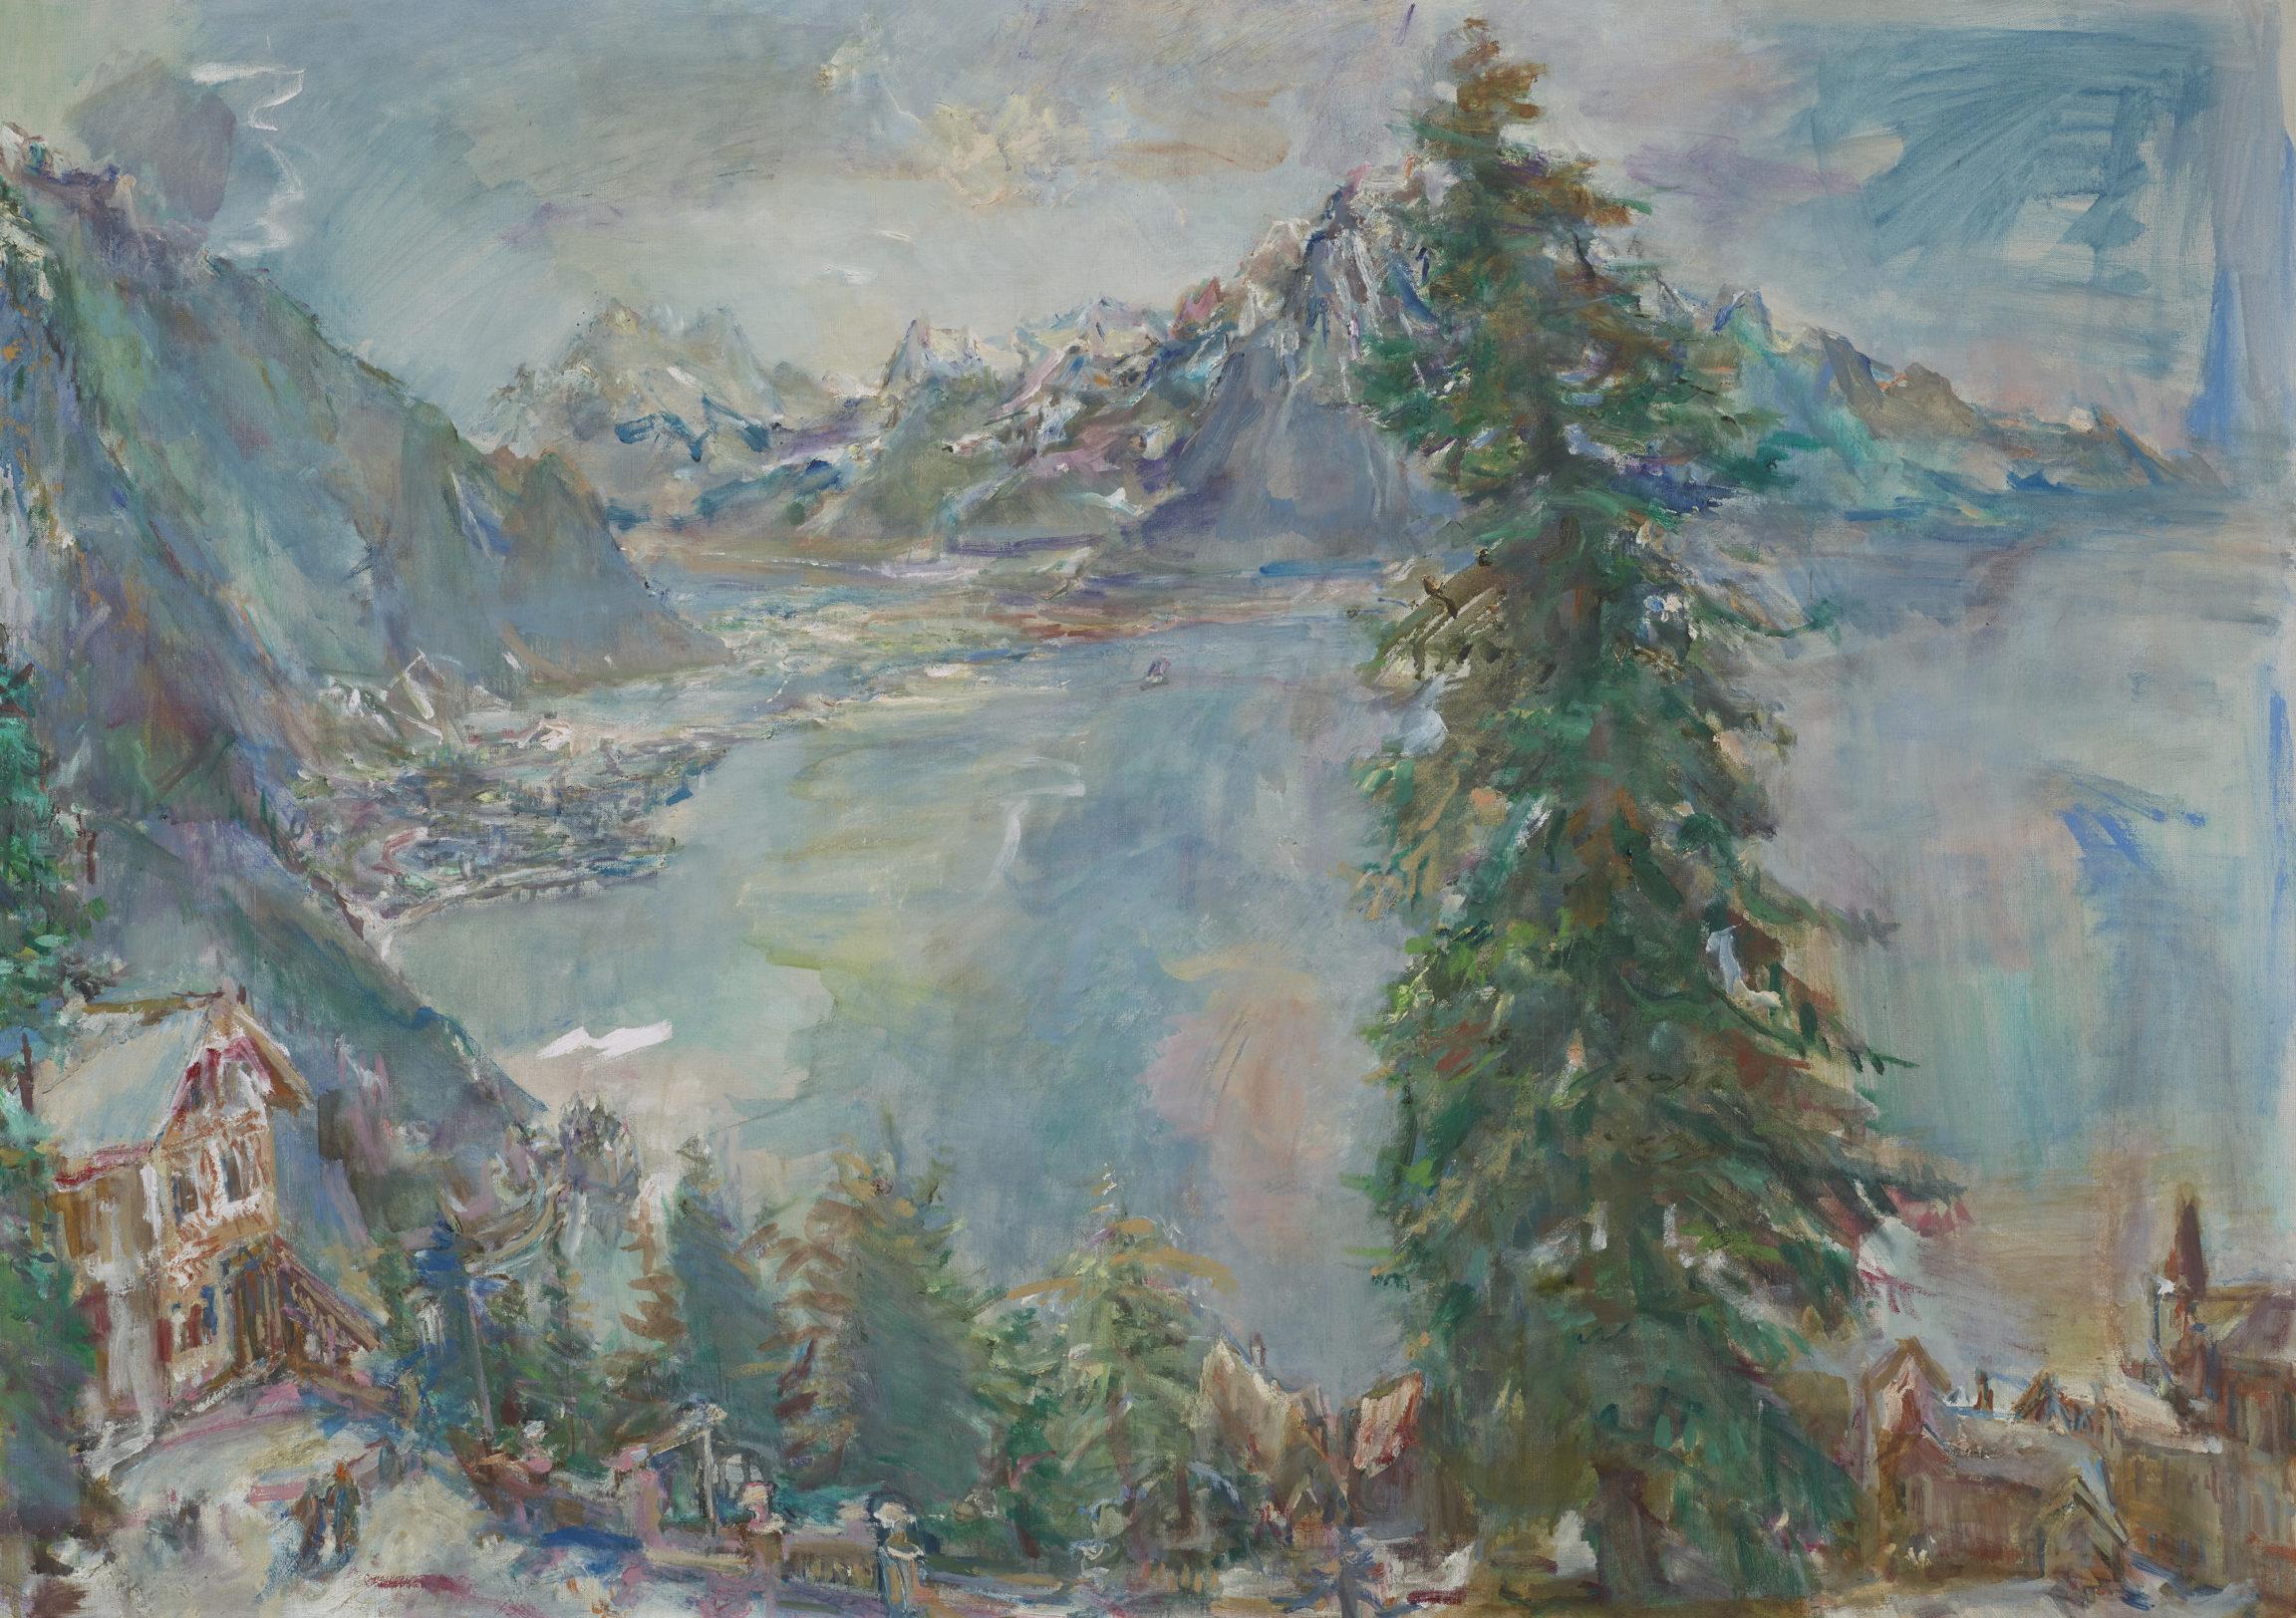 Oskar Kokoschka , Glion, vue sur le lac Léman (Glion, View over Lake Geneva), 1956